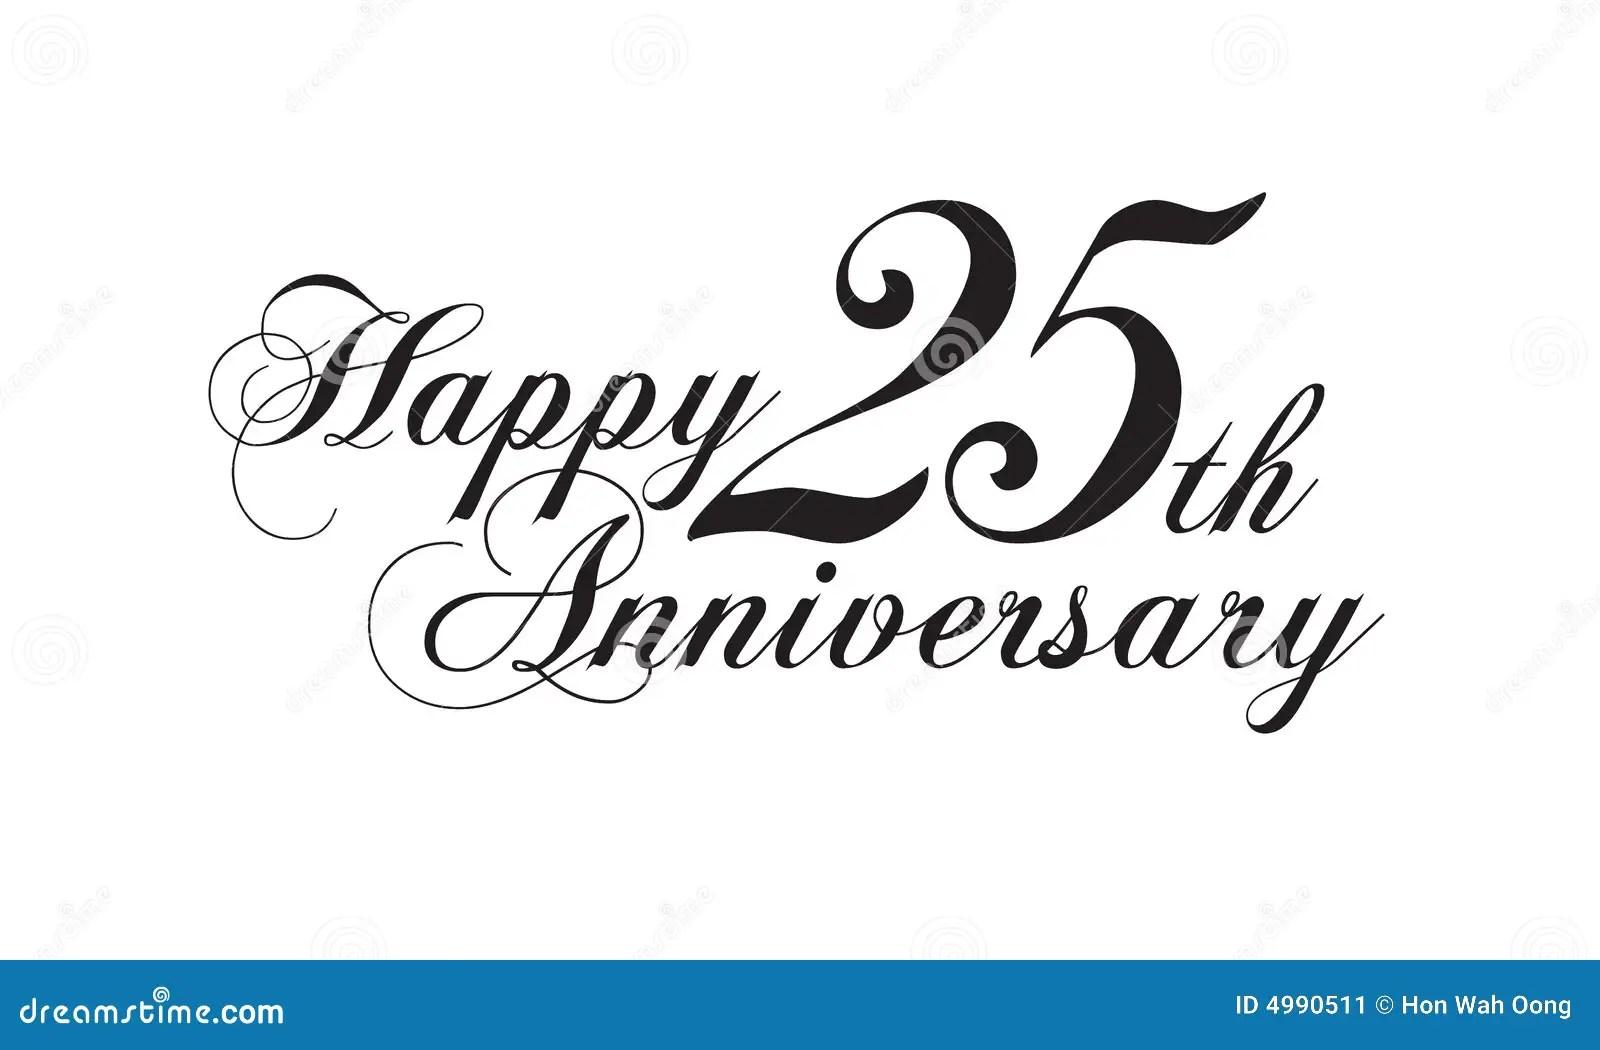 Happy 25th anniversary stock illustration. Illustration of